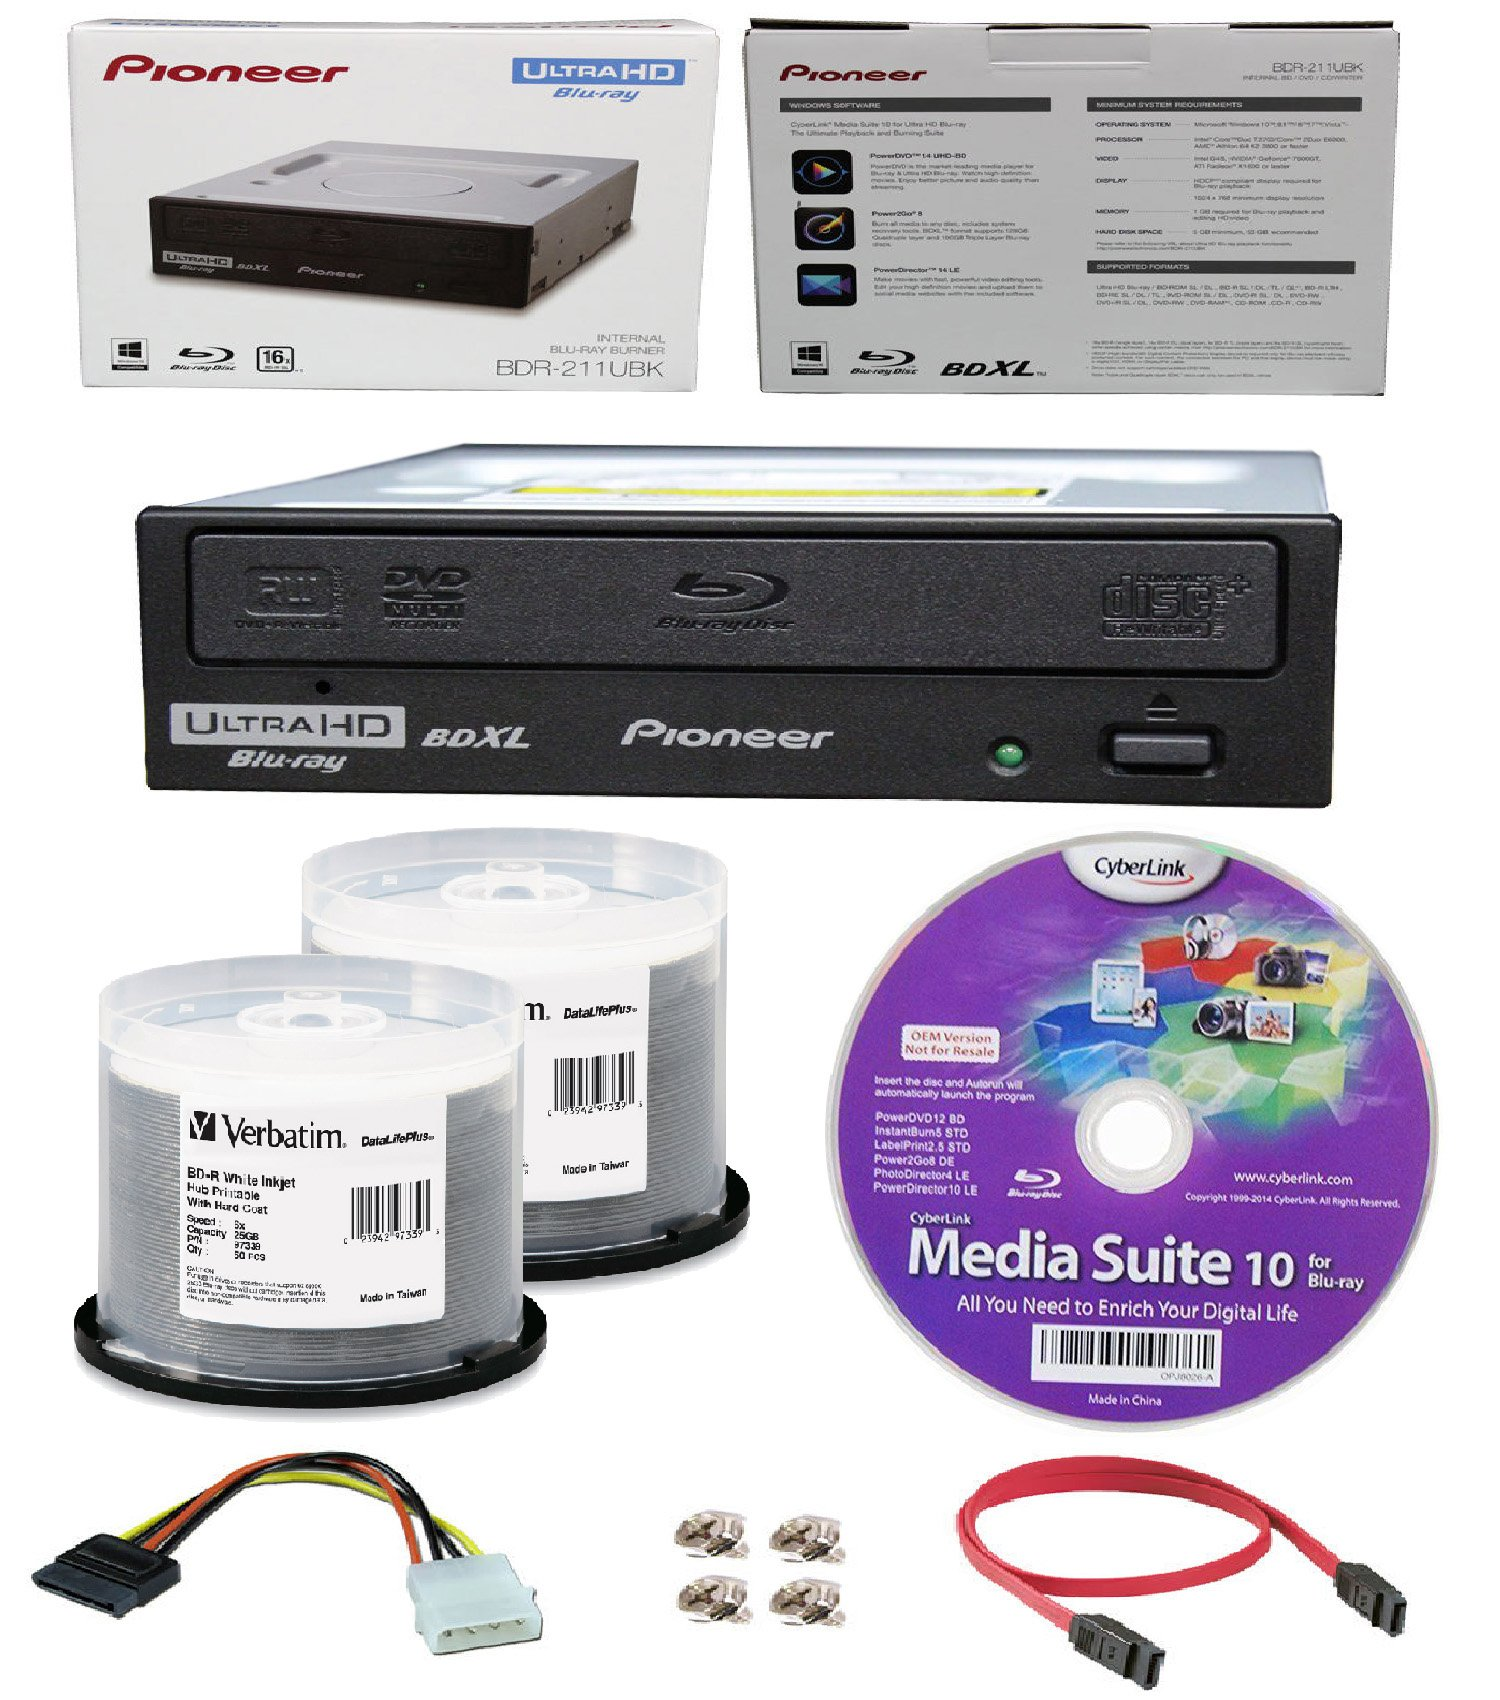 Pioneer 16x BDR-211UBK Internal Ultra HD Blu-ray BDXL Burner, Cyberlink Software and Cable Accessories Bundle with 100pk BD-R Verbatim 25GB 6X DataLifePlus White Inkjet, Hub Printable by Produplicator